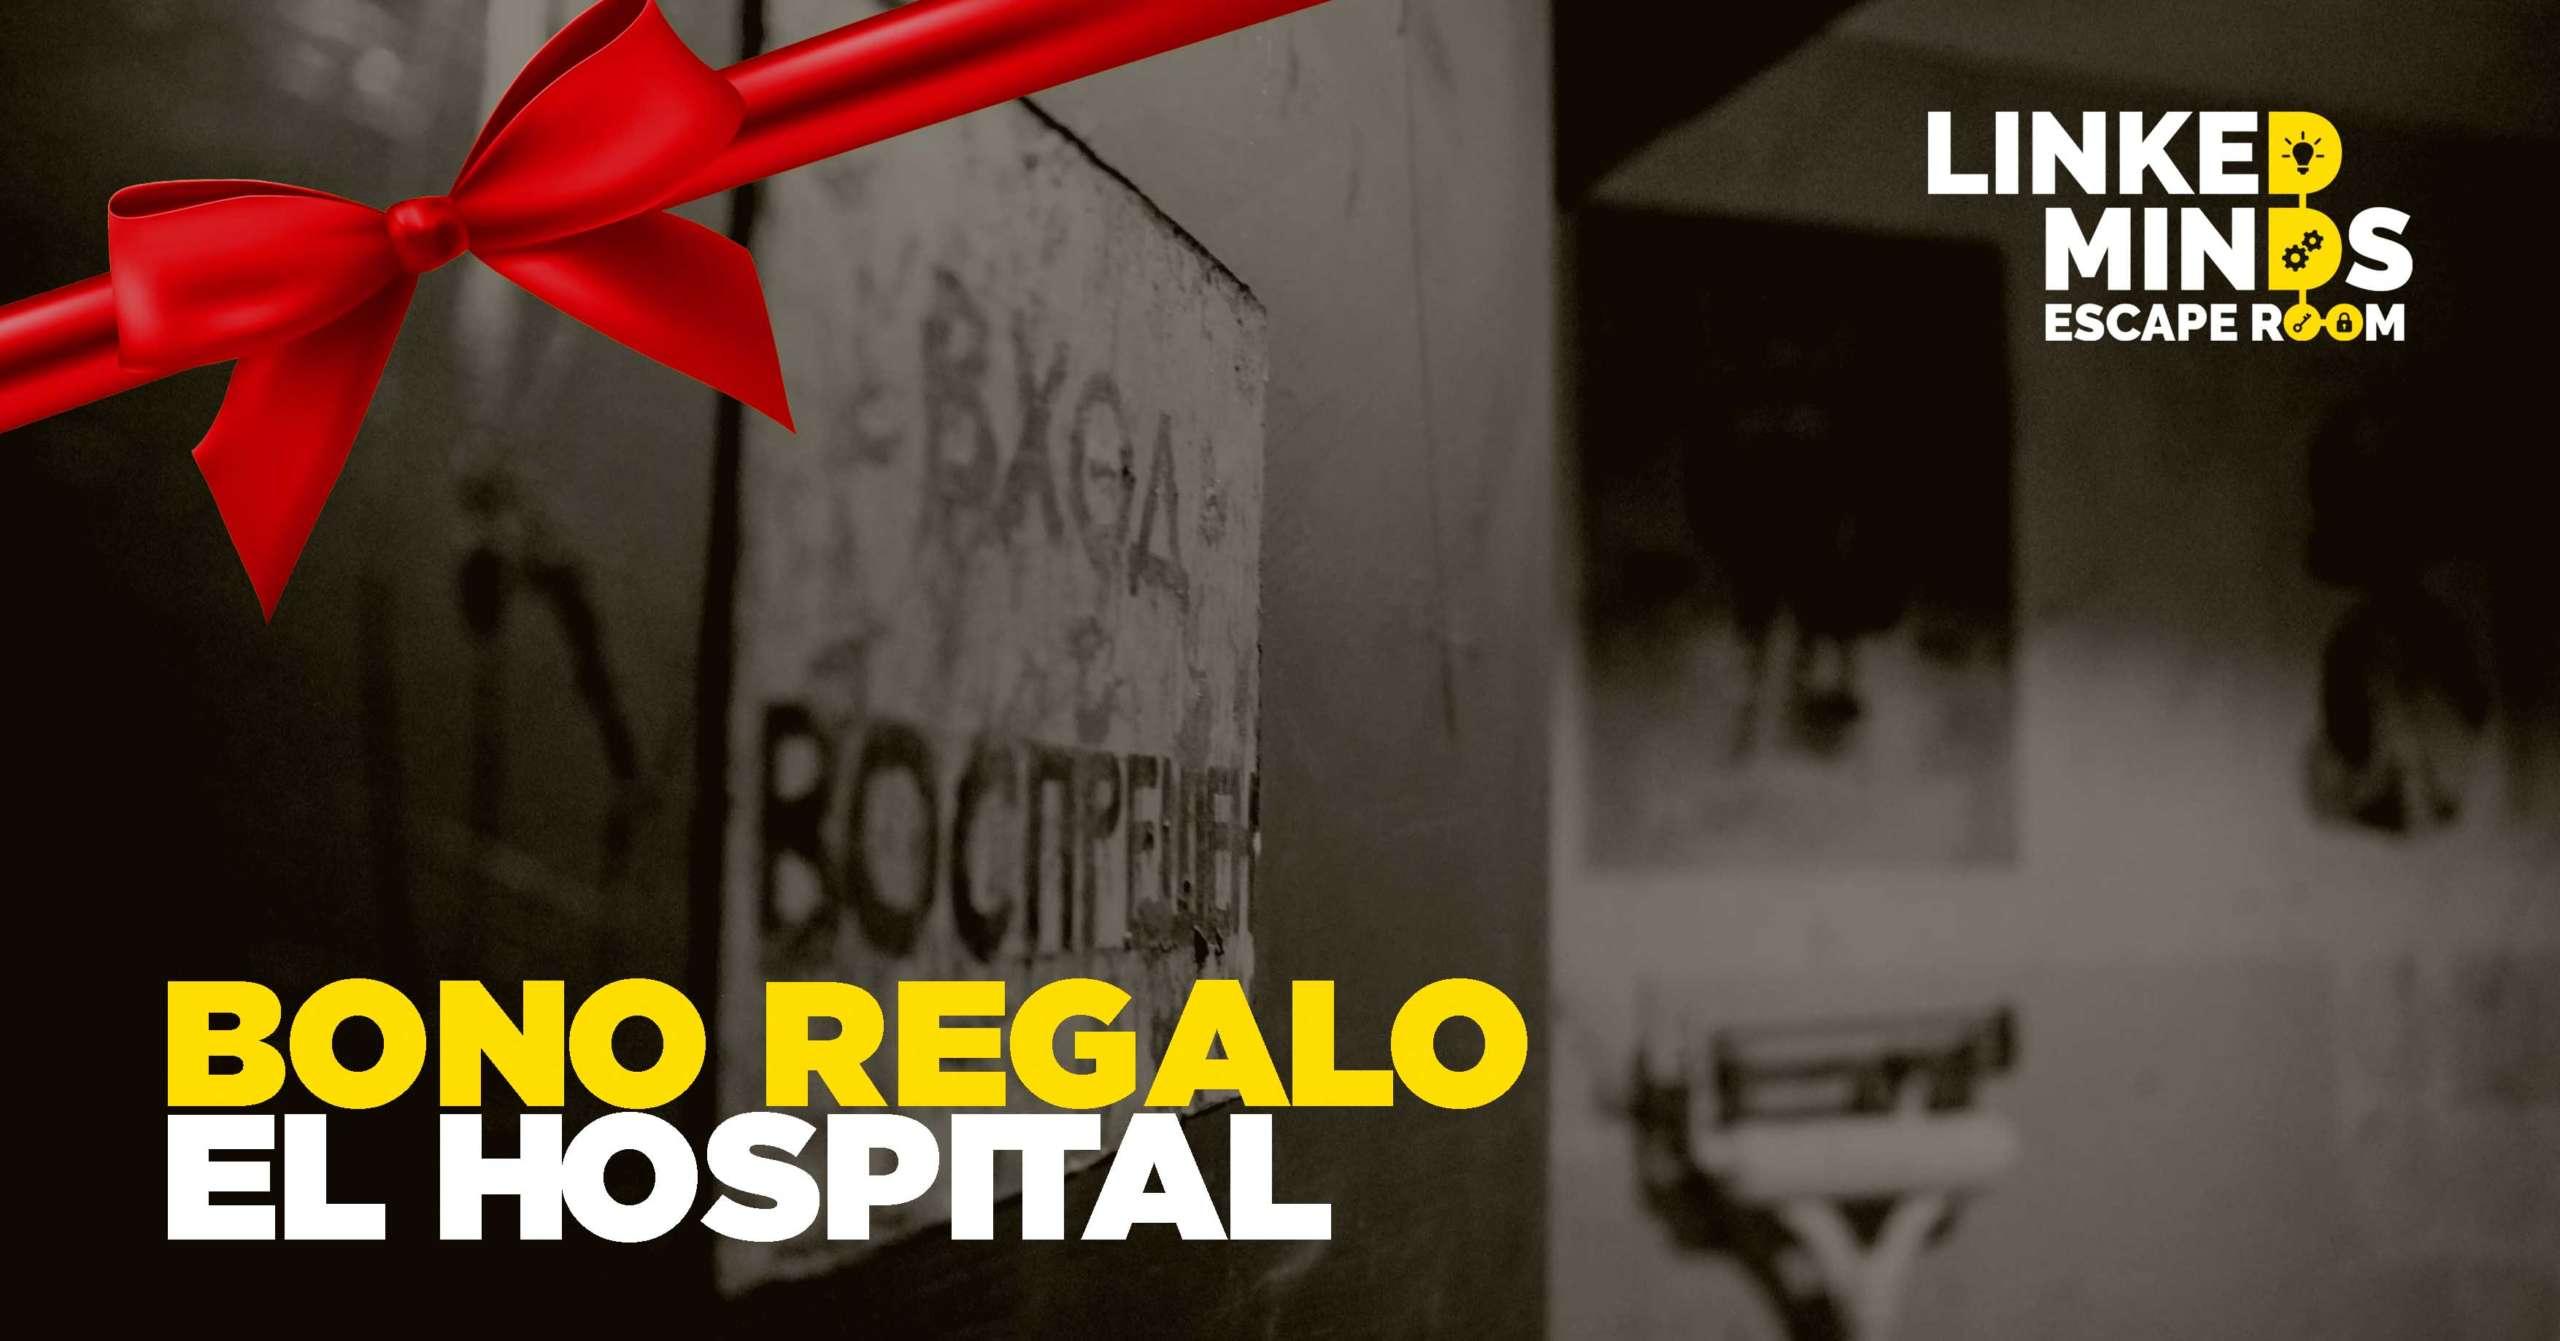 linked minds el hospital bono regalo escape room madrid